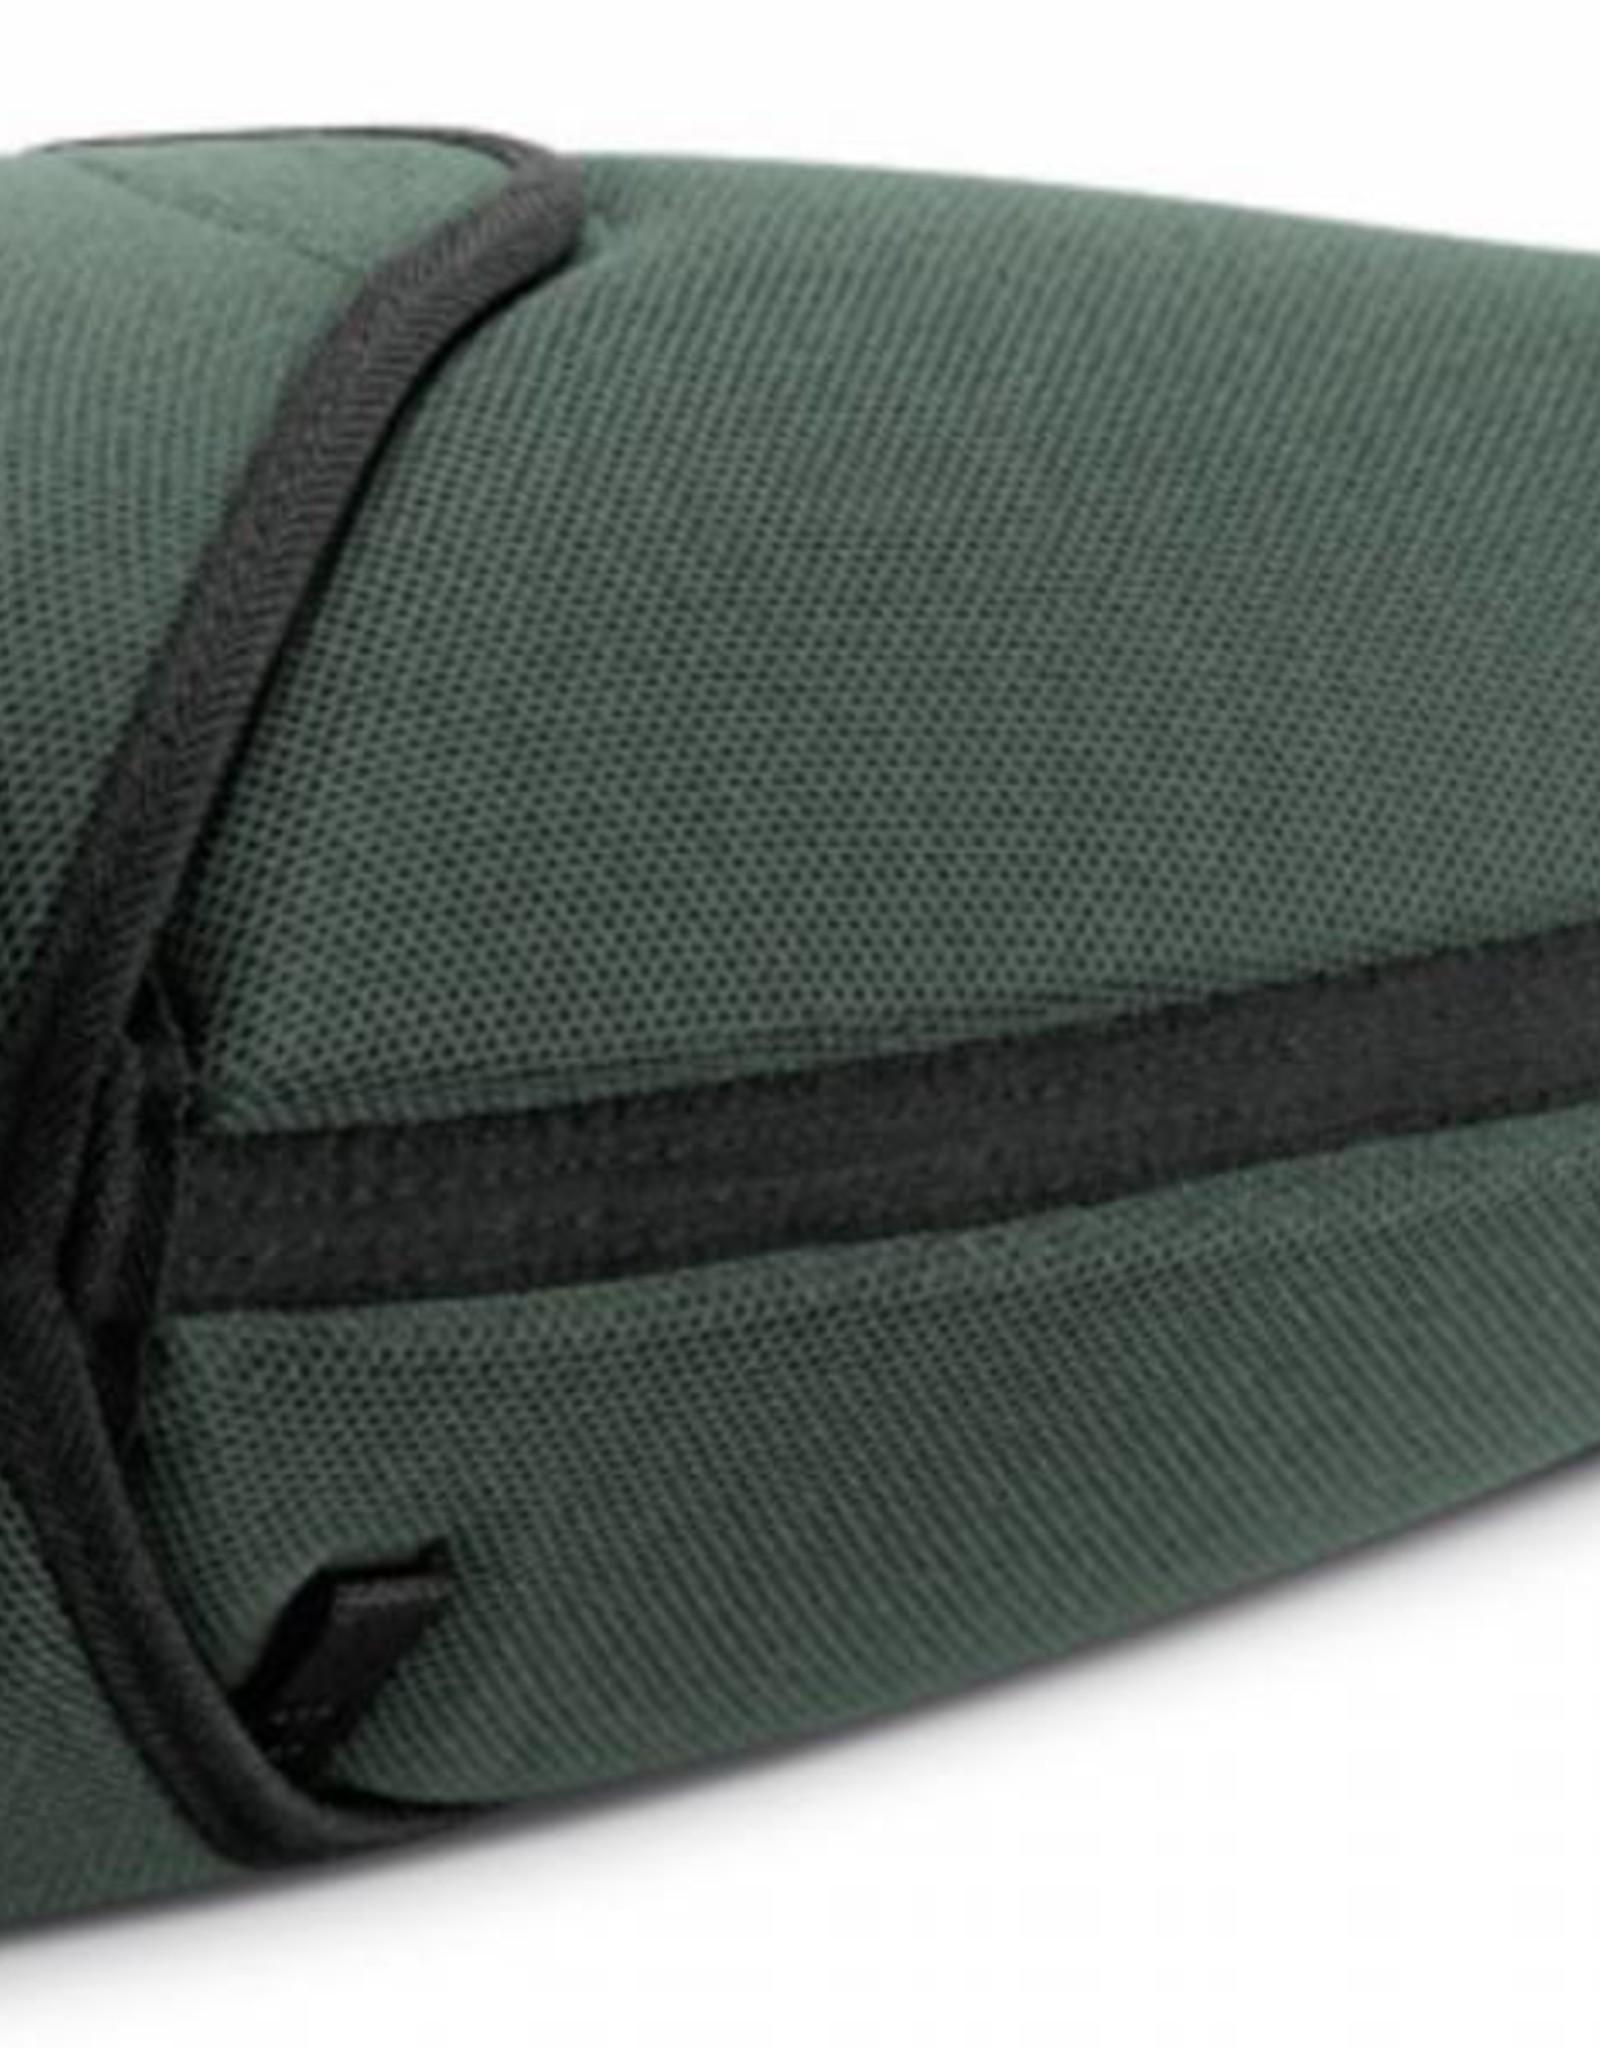 Swarovski Optik Stay on Case 95 Objective